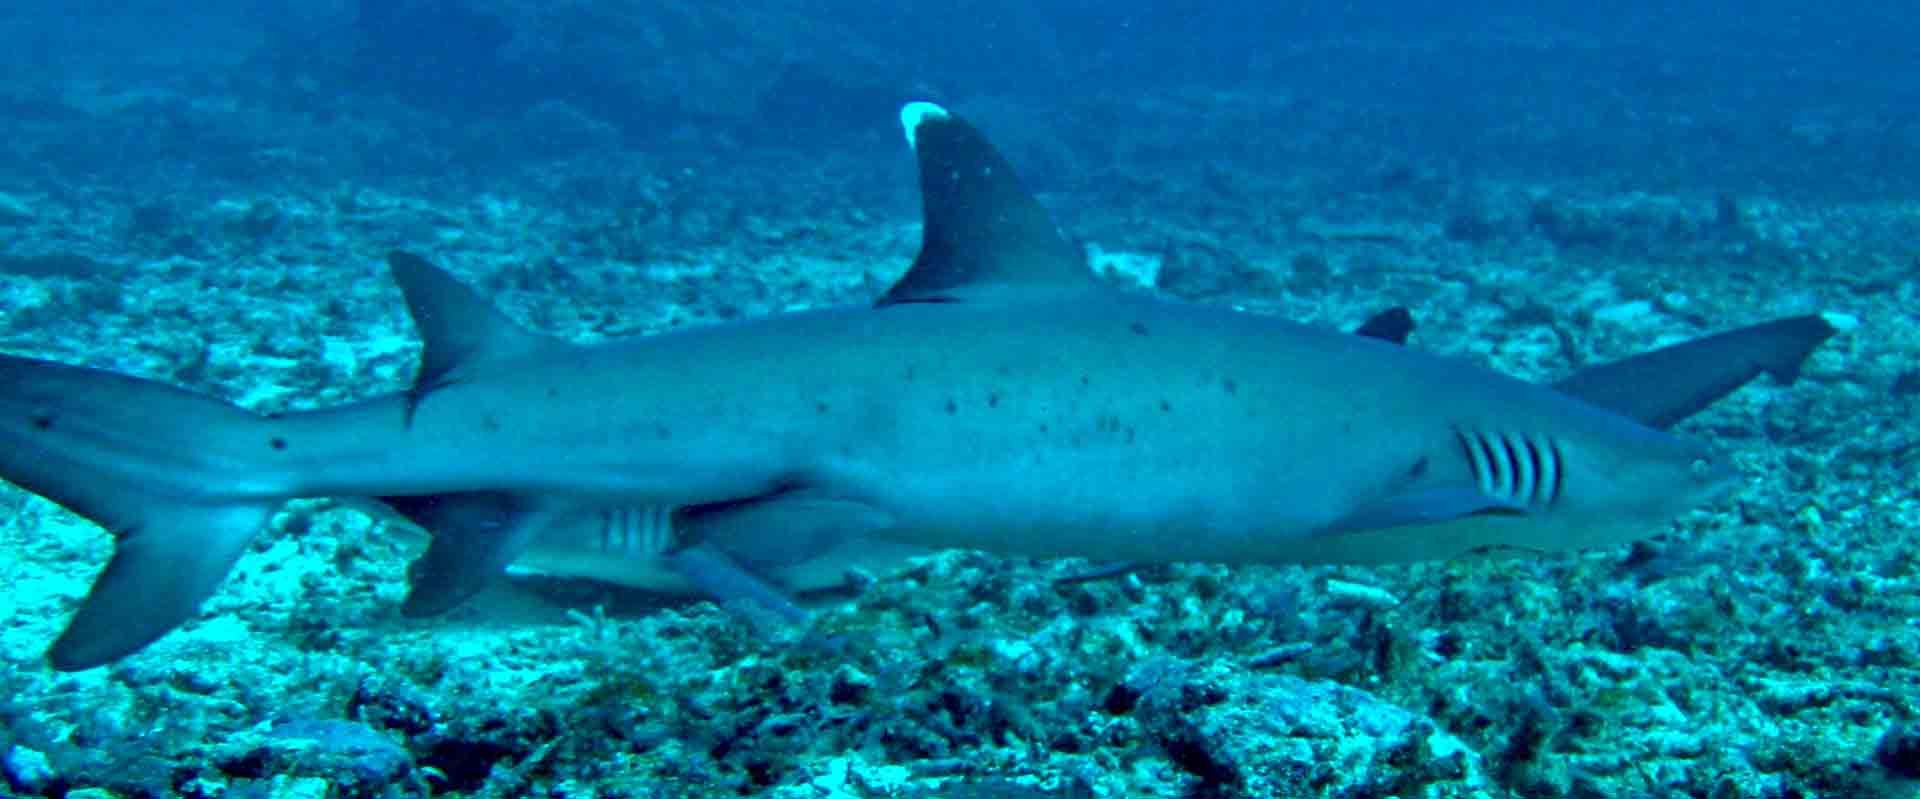 Gili-Trawangan-Lombok-Activities-Activity-Scuba-Scubadive-Scubadiving-Dive-Diving-100.jpg